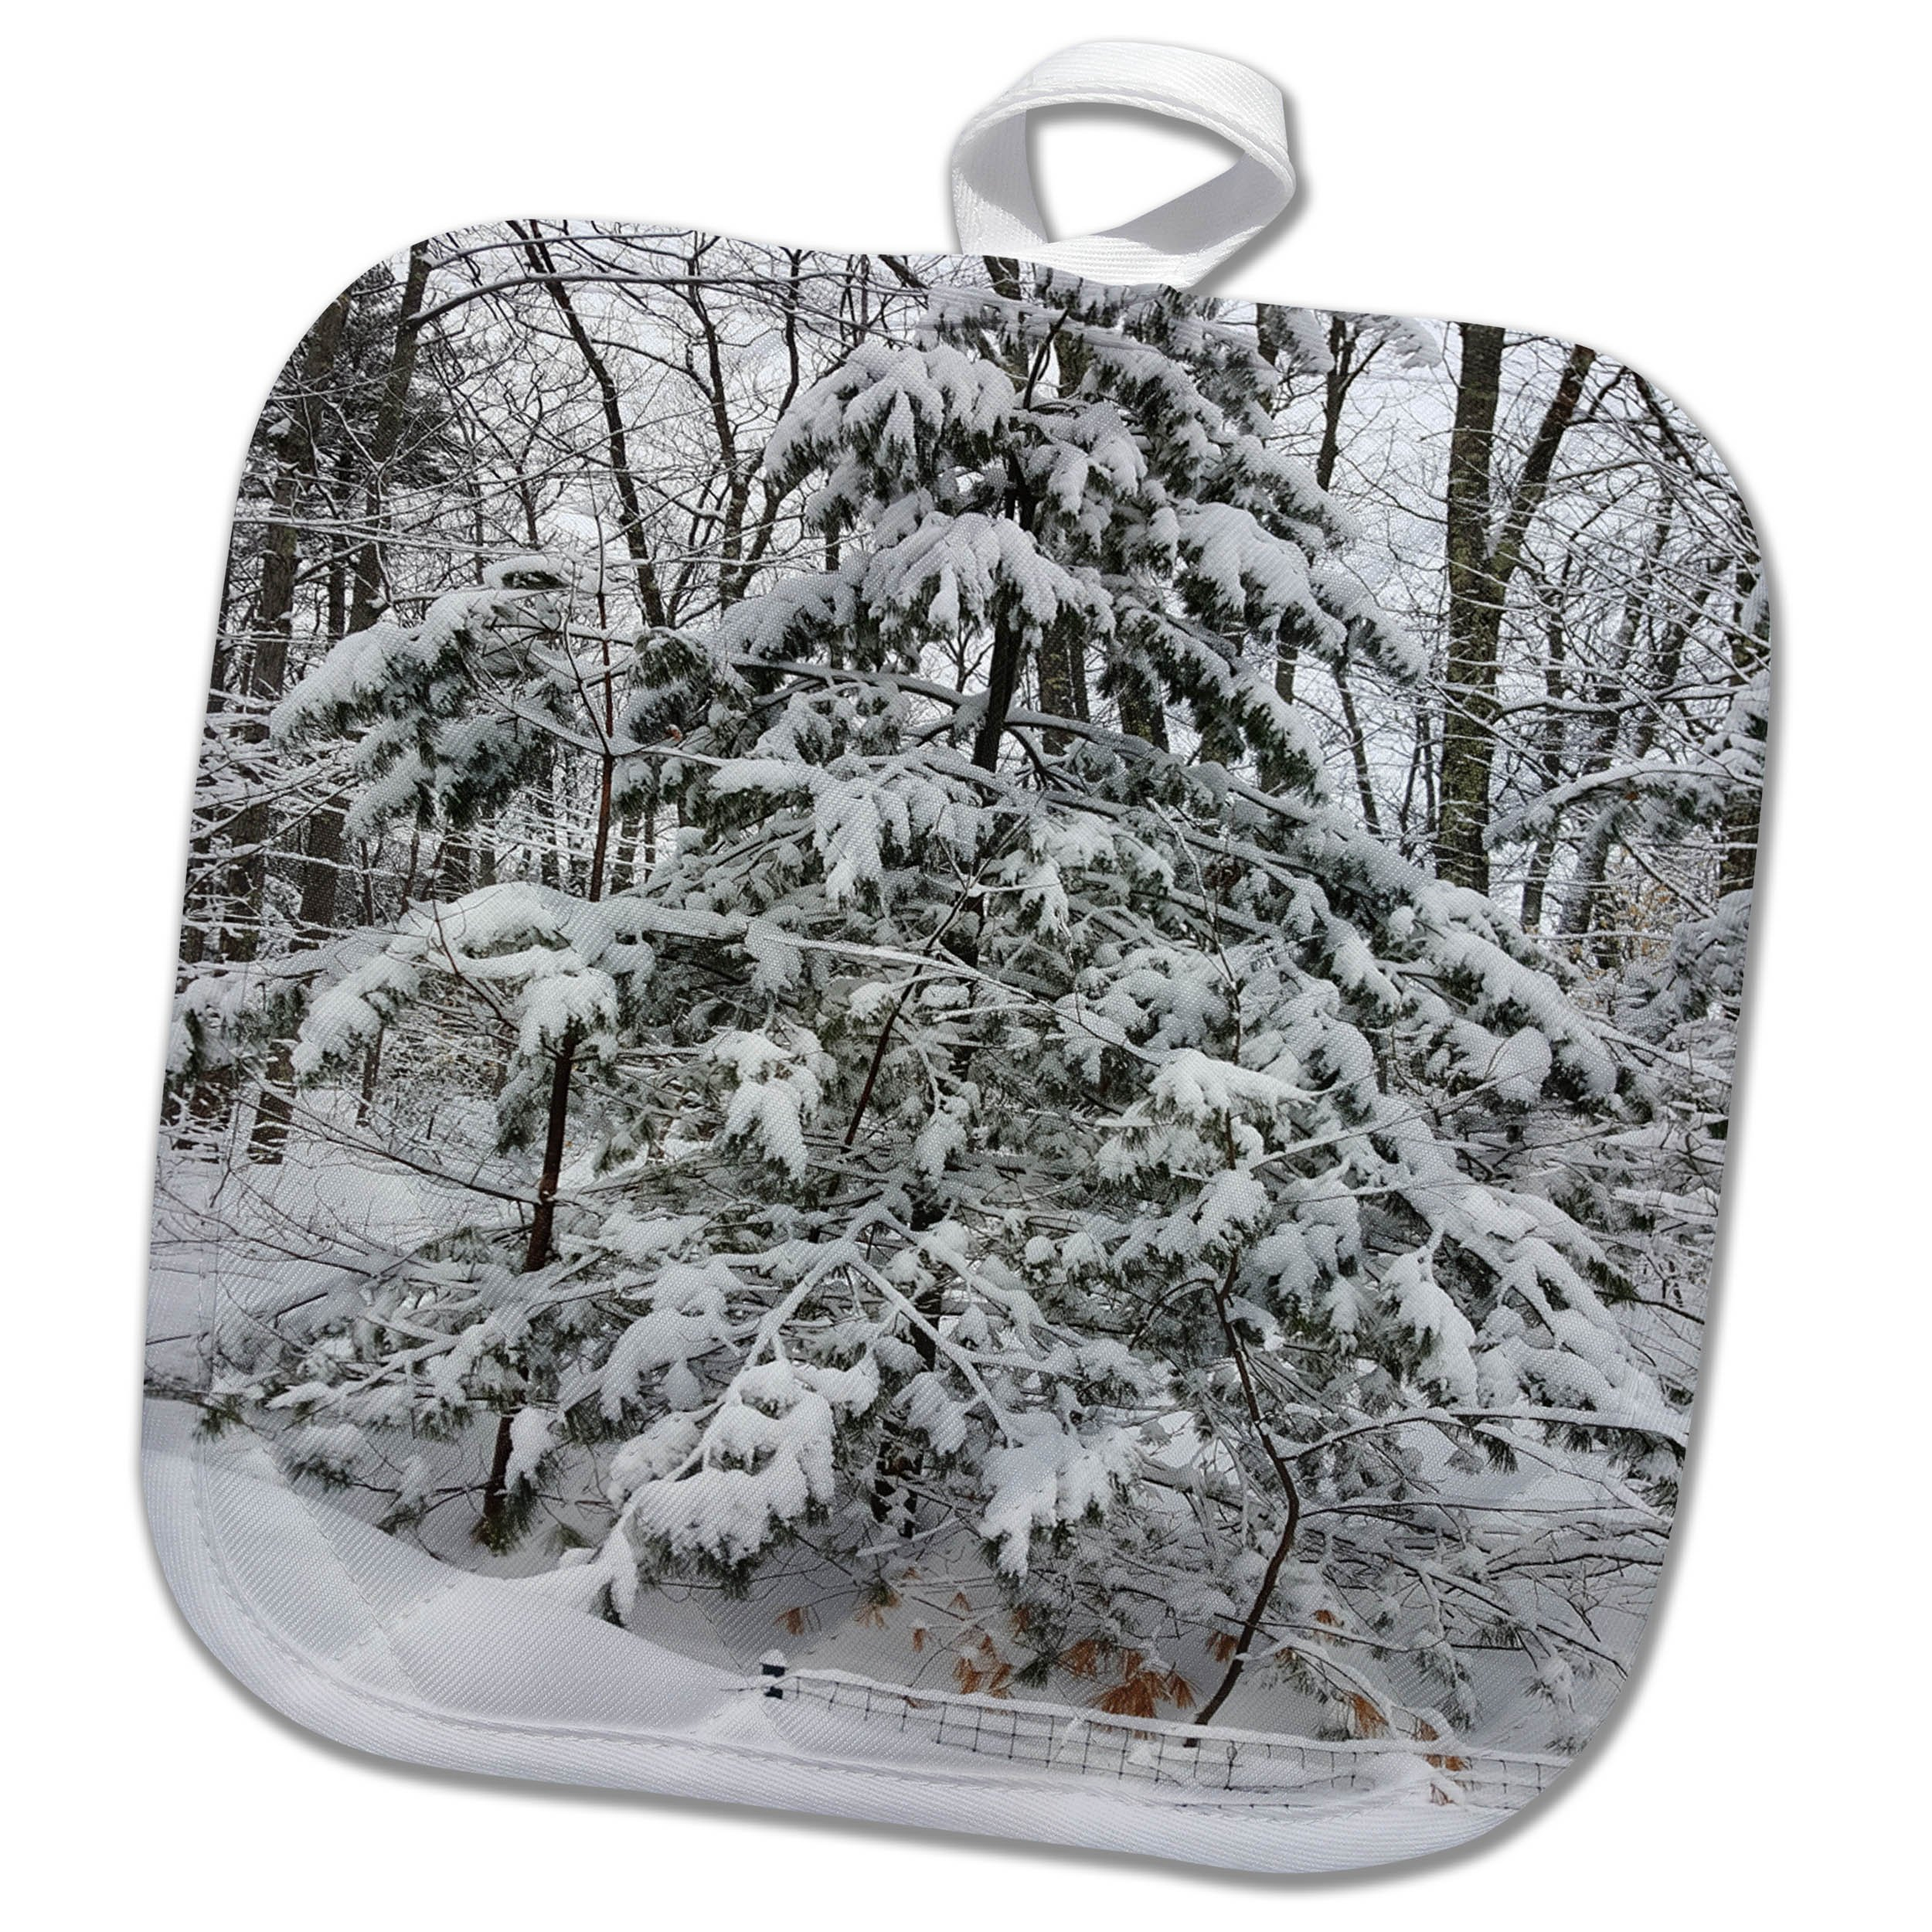 3dRose TDSwhite – Winter Seasonal Nature Photos - Woods After Snowstorm Winter Weather - 8x8 Potholder (phl_285065_1)